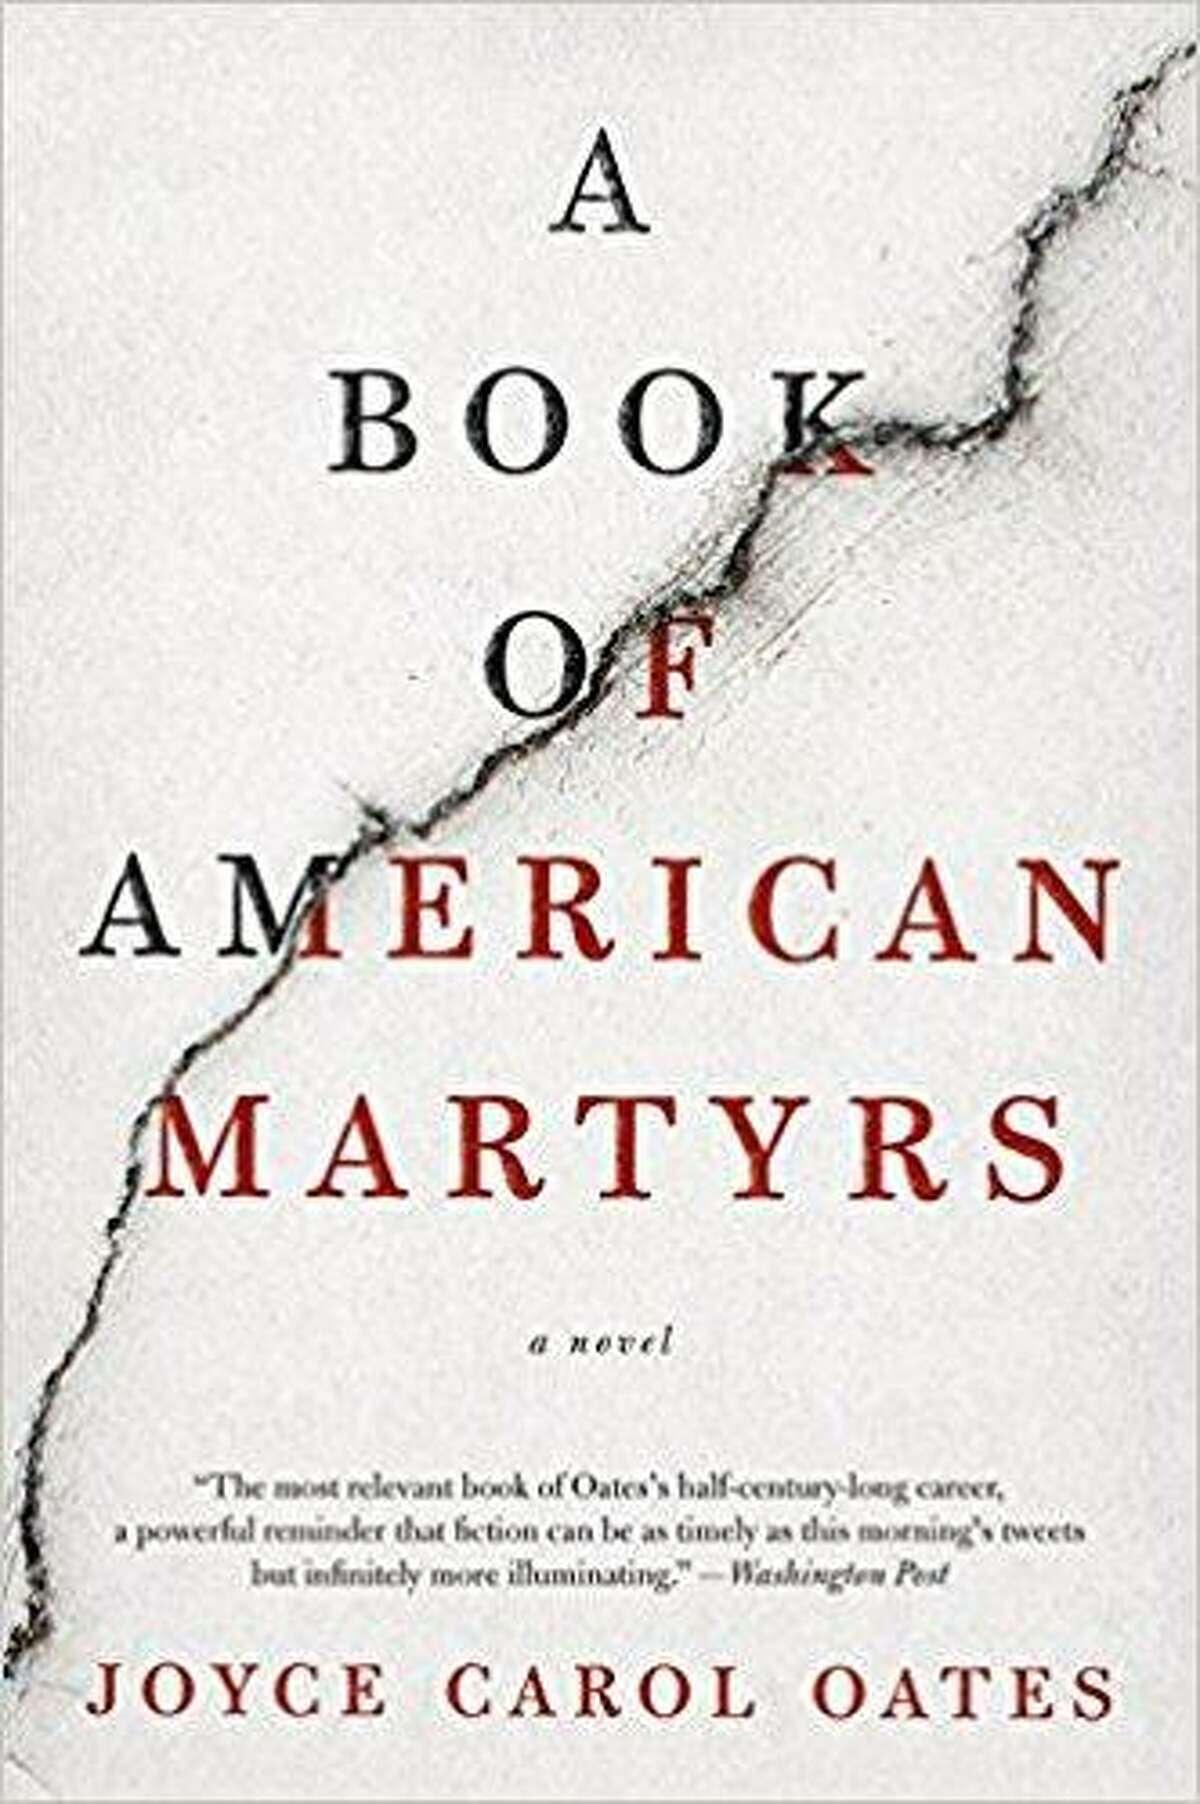 A Book Of American Martyrs By Joyce Carol Oates Ecco, $29.99 (fiction)